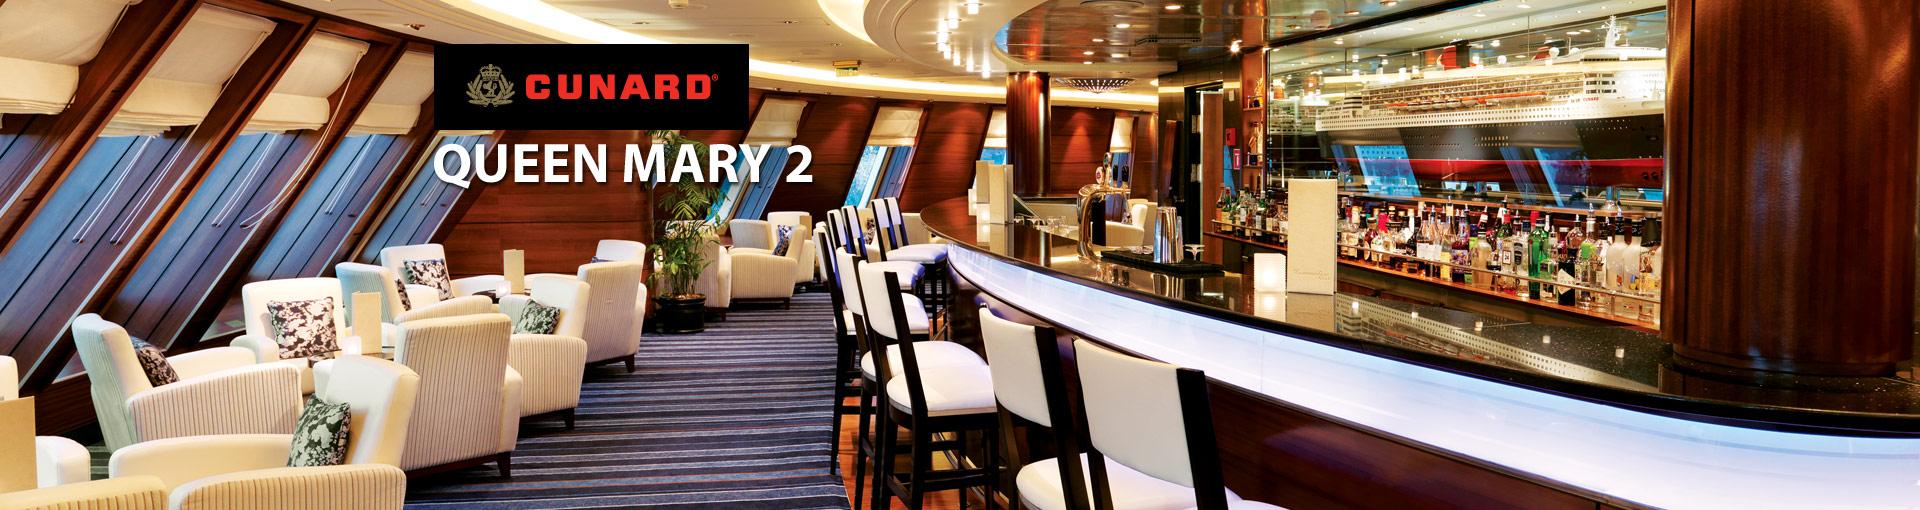 Cunard Line Queen Mary 2 cruise ship